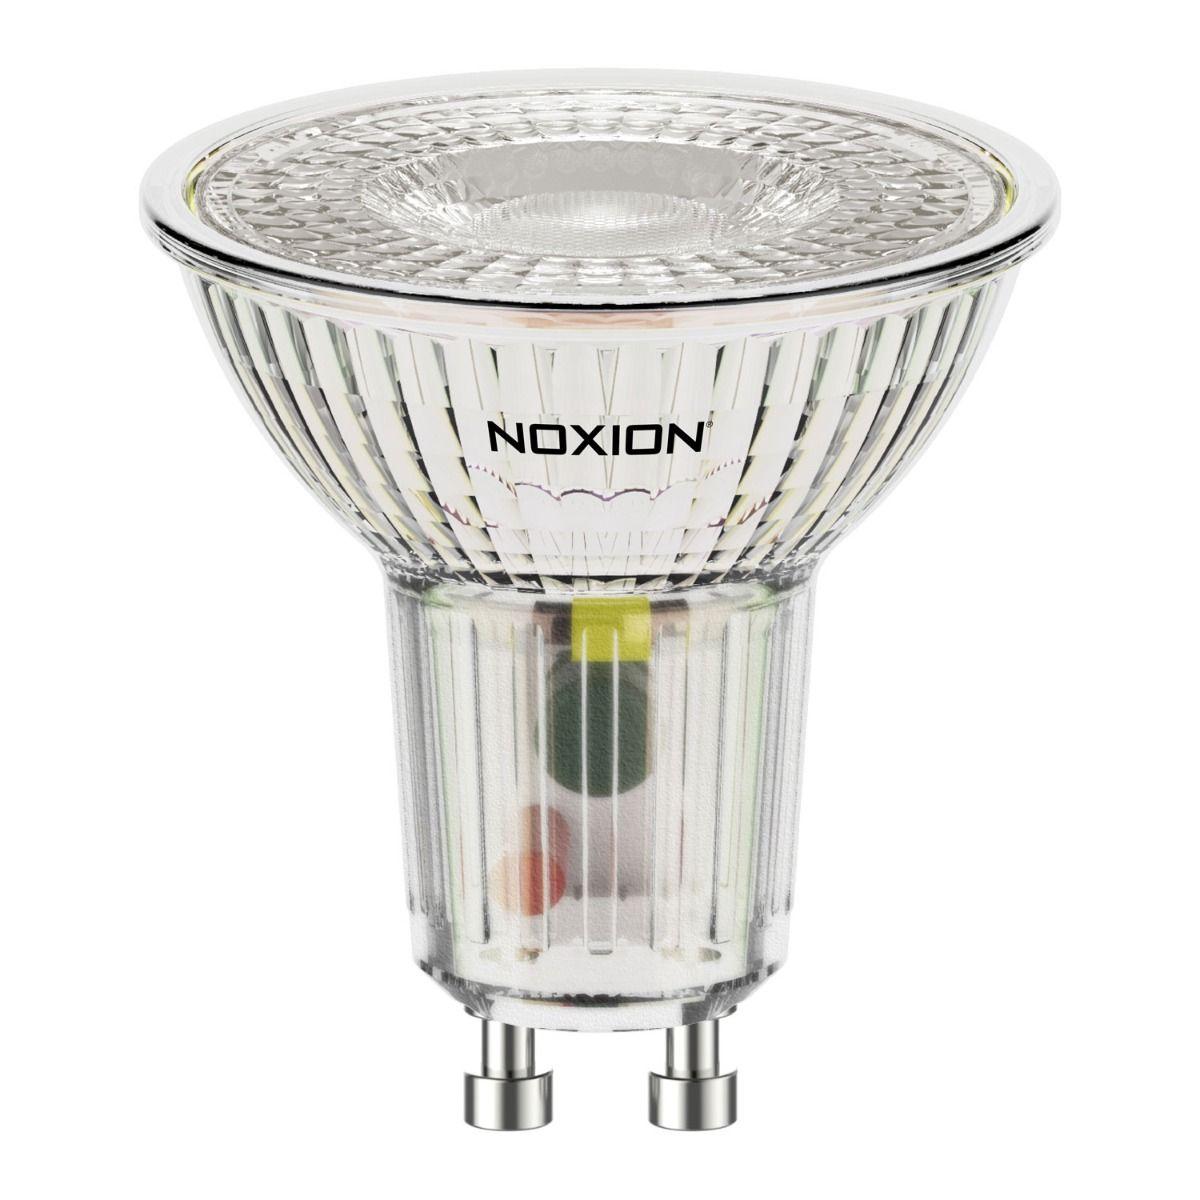 Noxion LED Spot GU10 4W 827 36D 390lm | Vervanger voor 50W